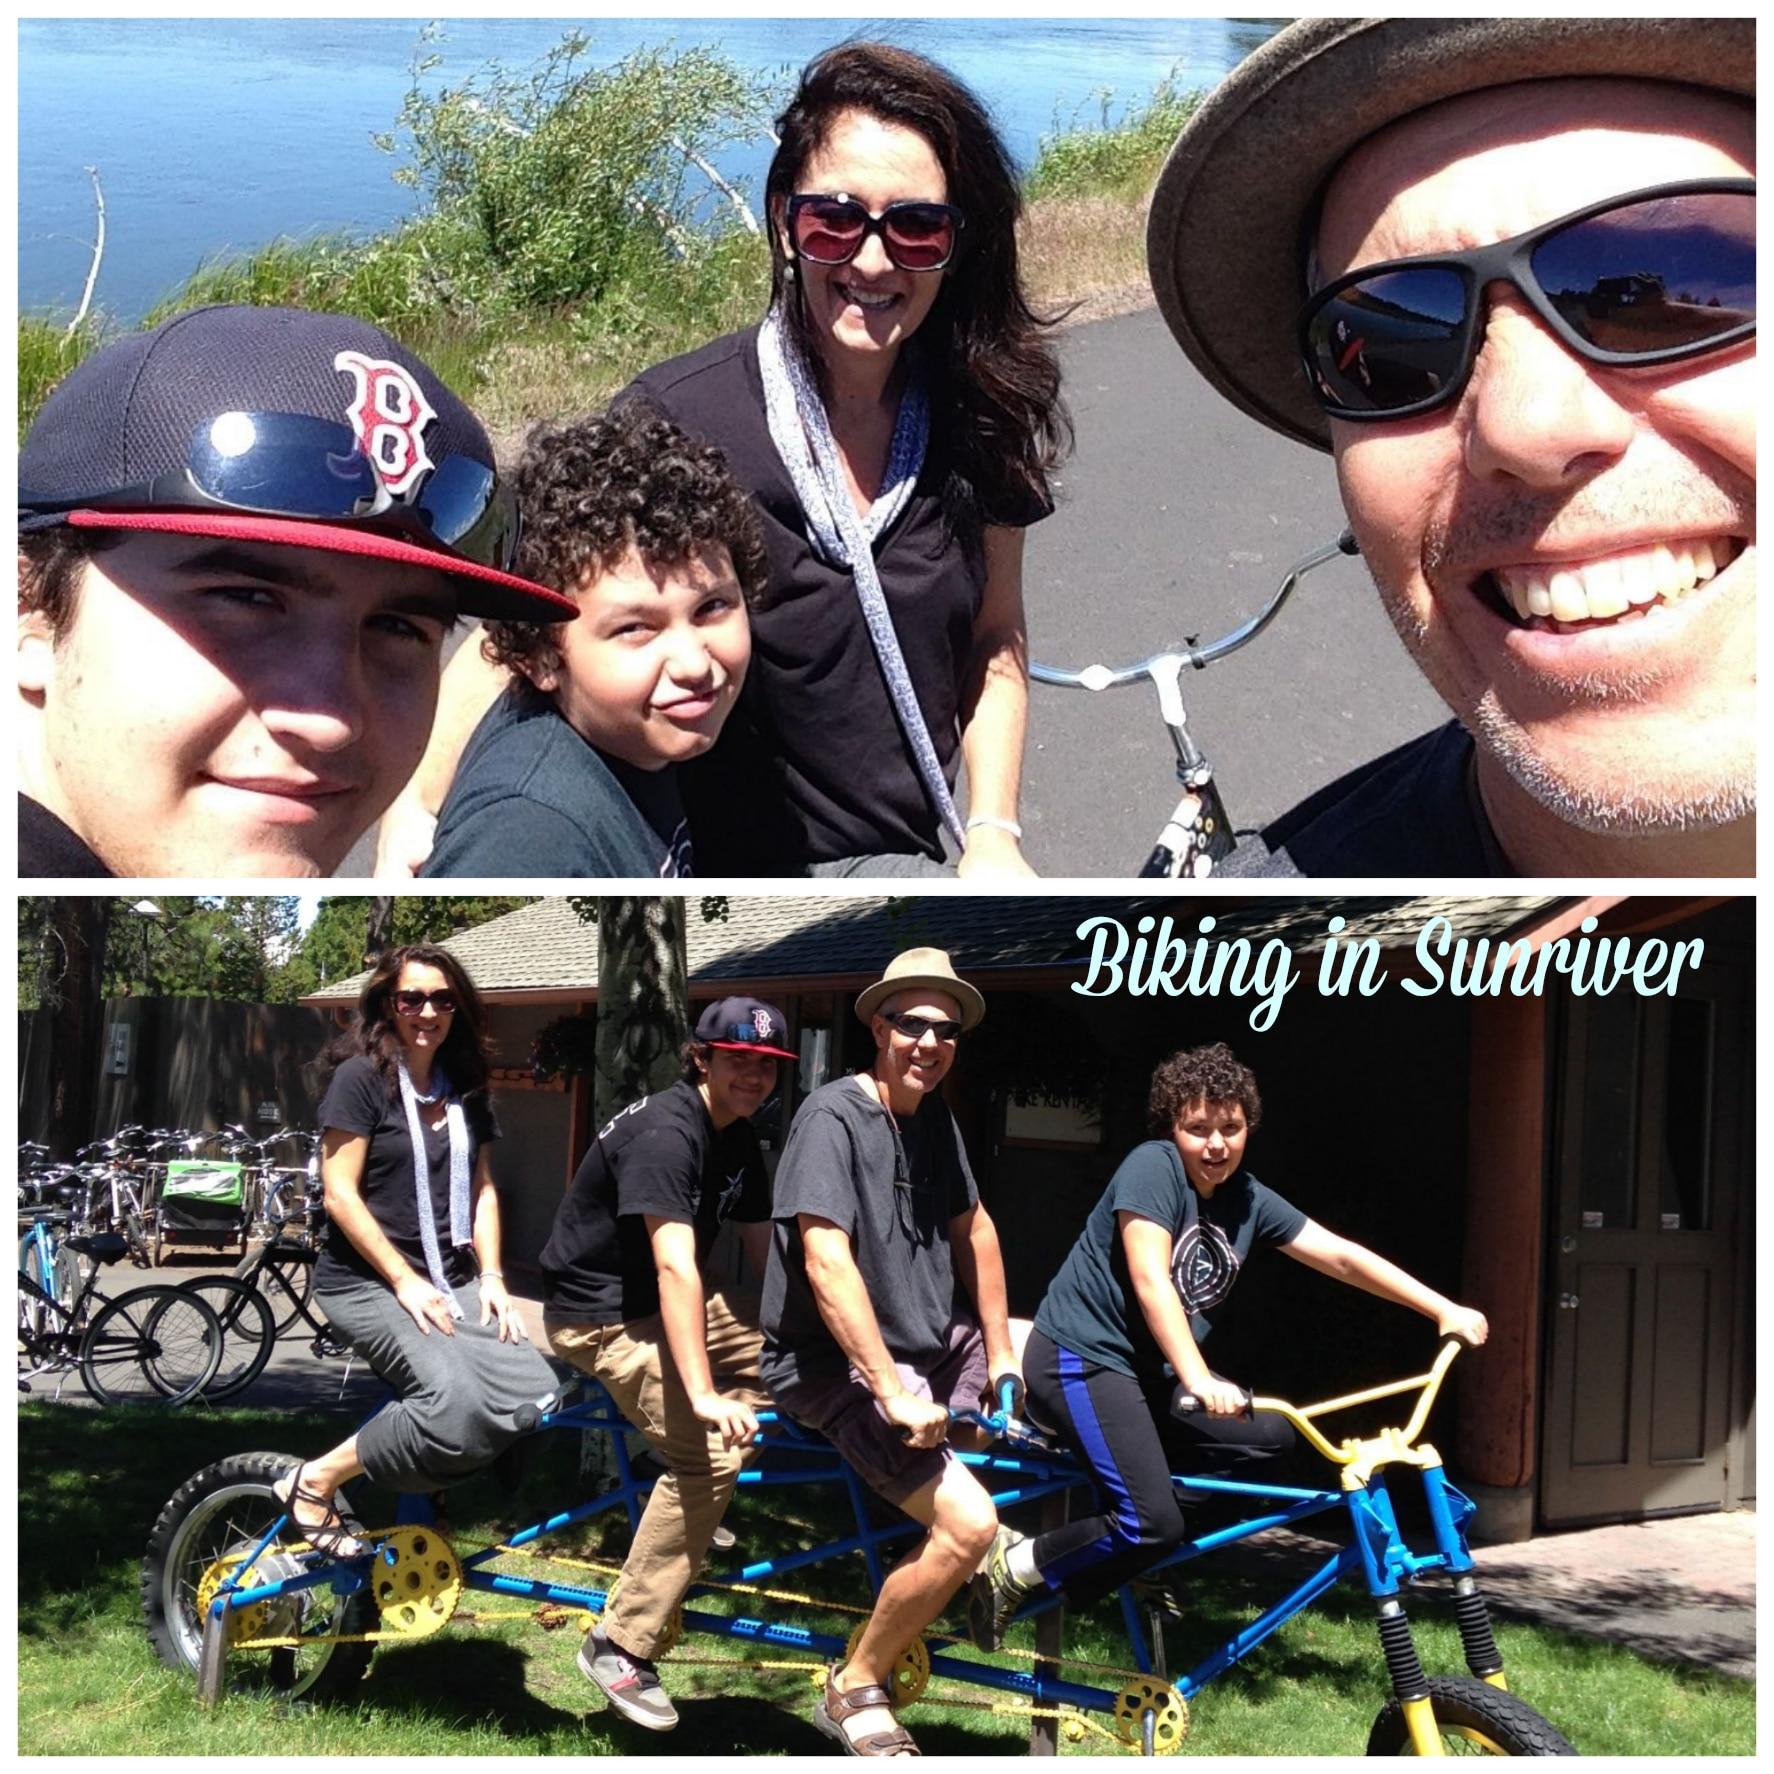 biking sunriver collage